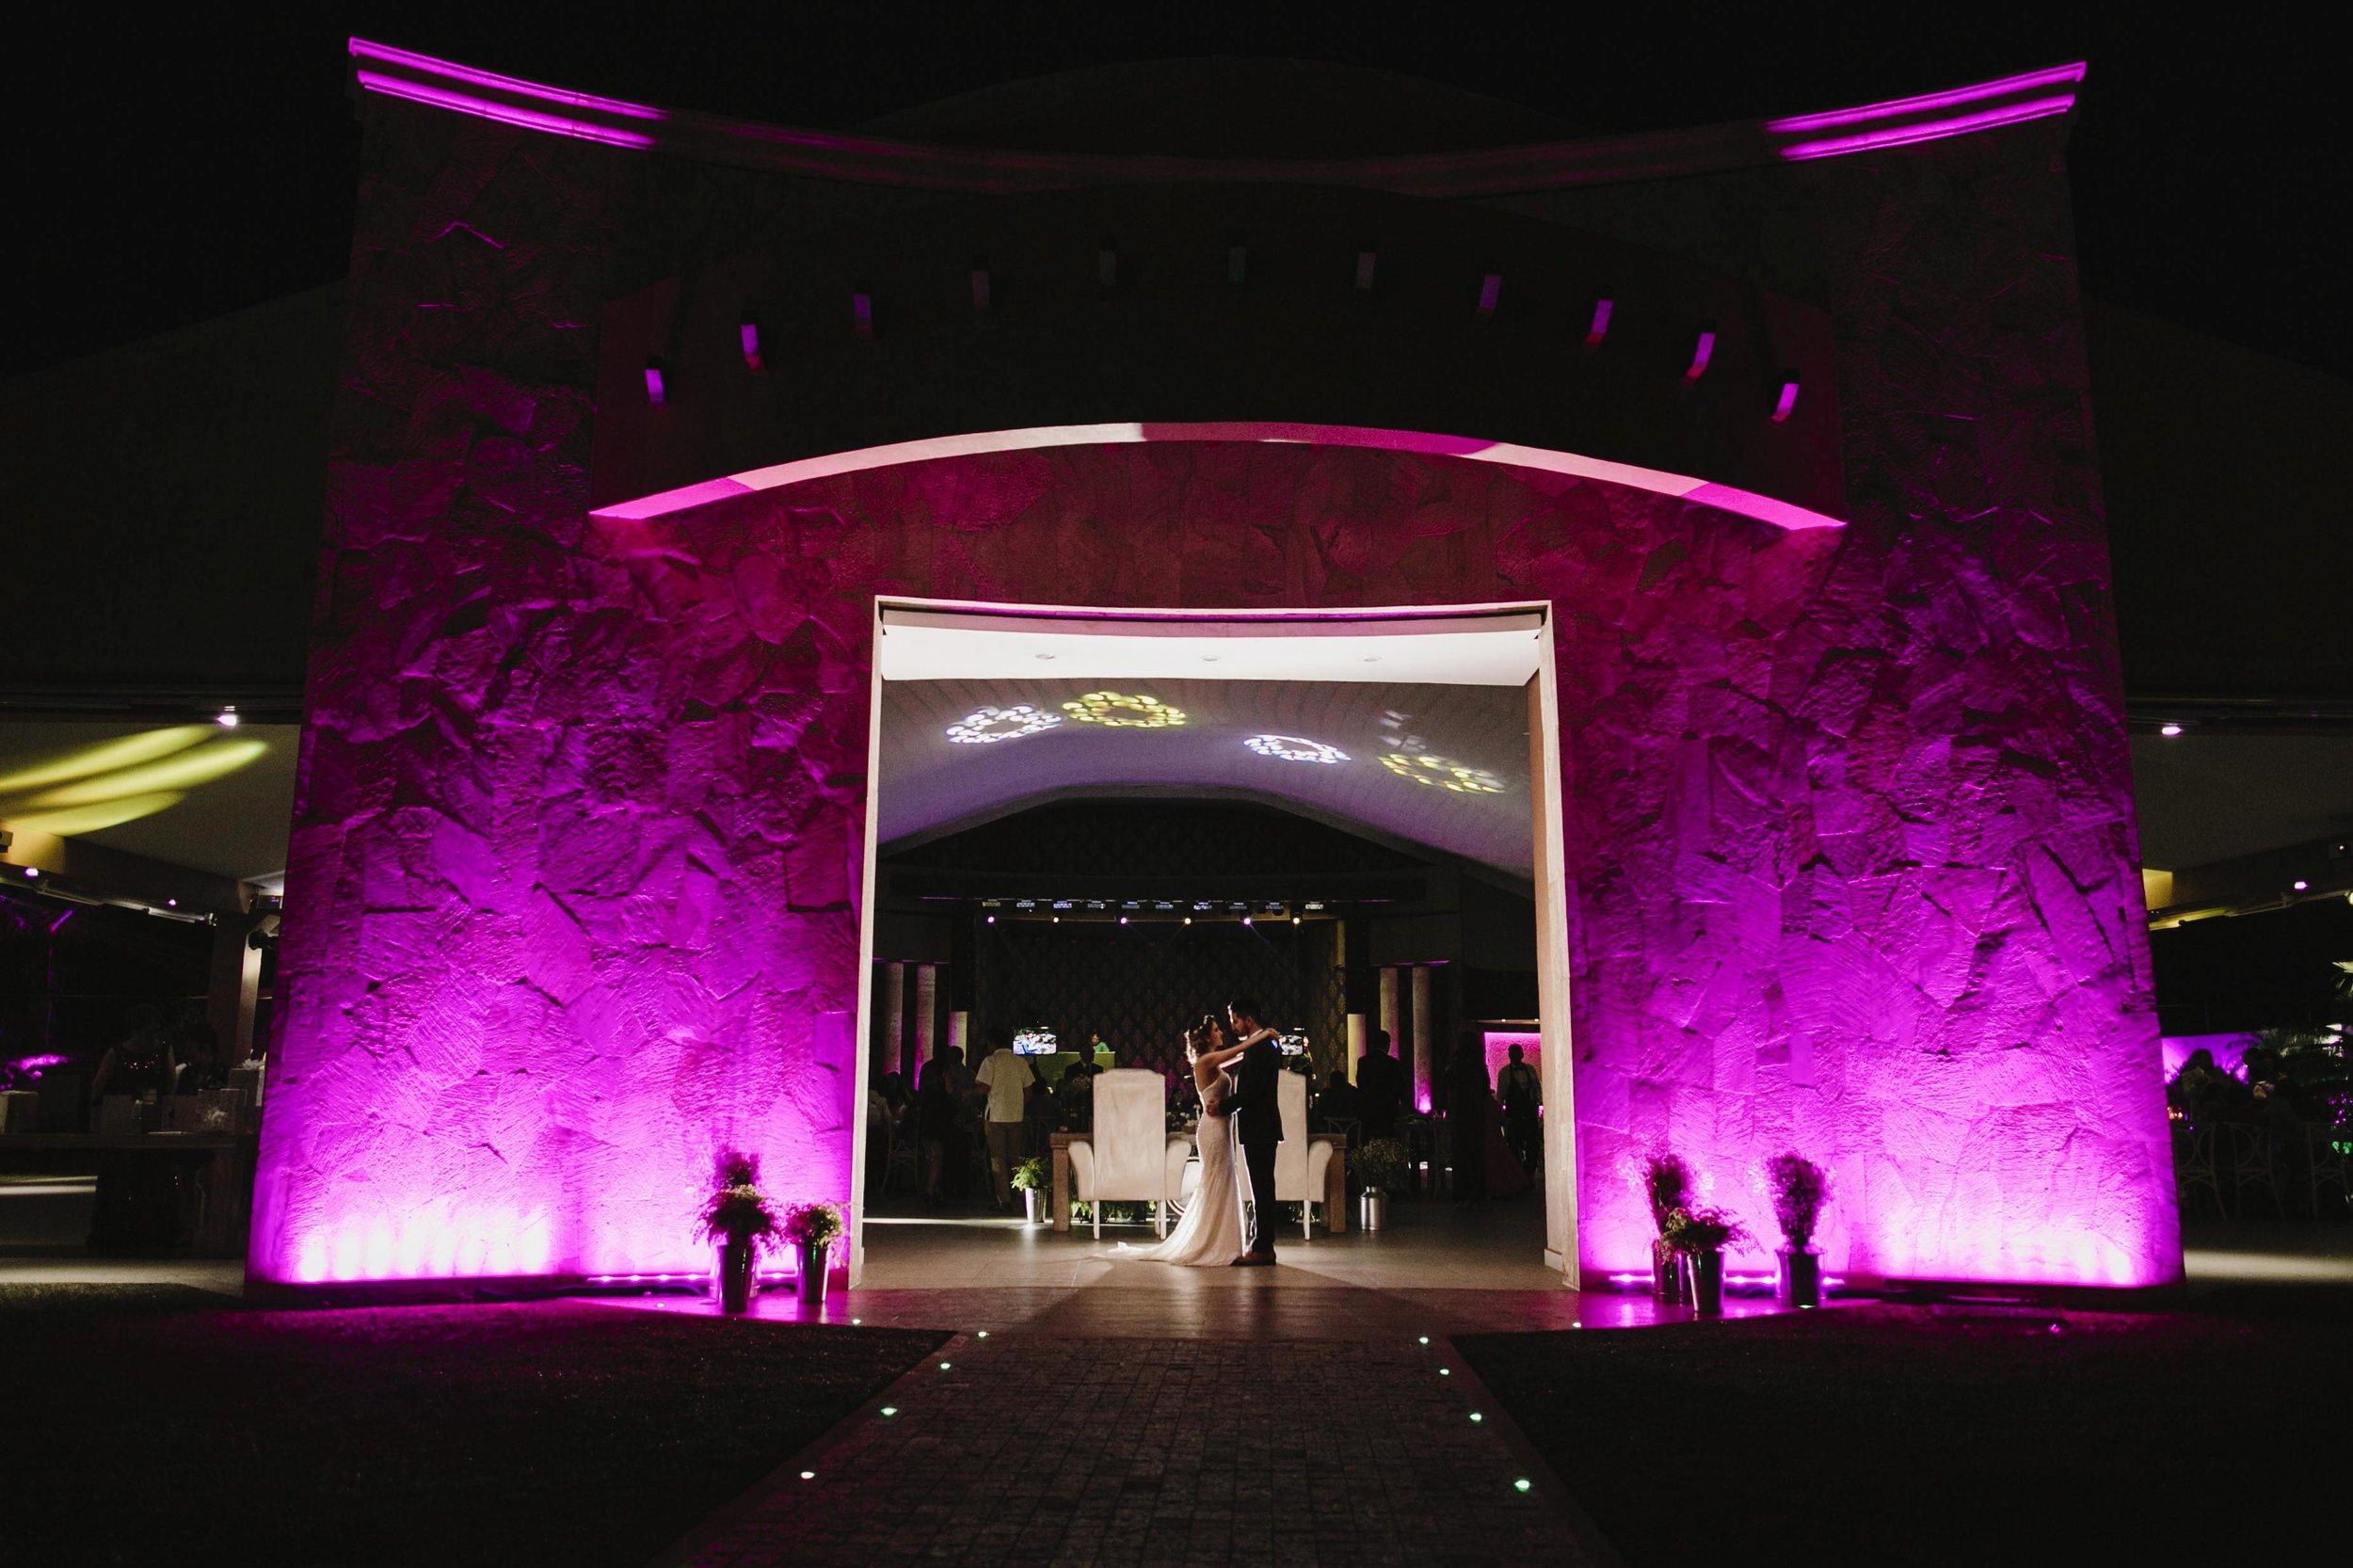 alfonso_flores_destination_wedding_photography_jardin_amarello_cuernavaca10.jpg